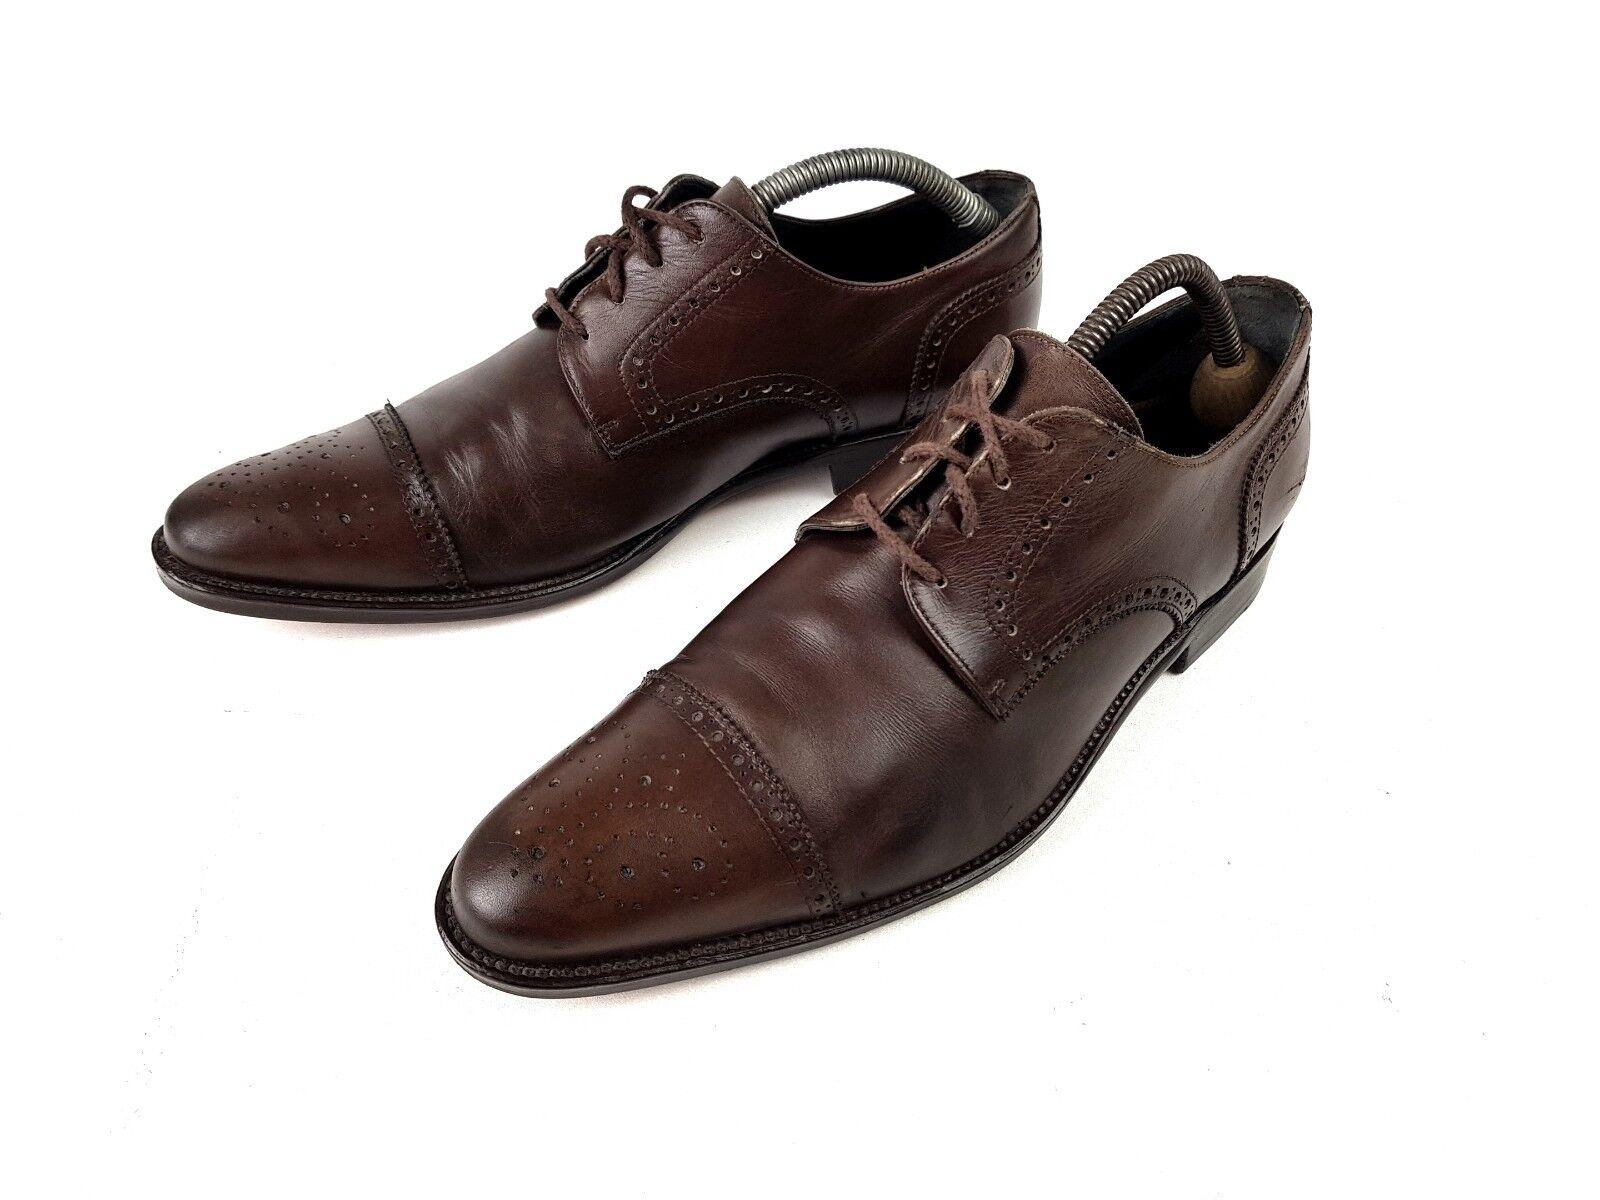 LLOTTUSSE SELECTION  Business-Schuhe Herren ORIGINAL BRAUN 41,5 7/5  ORIGINAL Herren 8be308